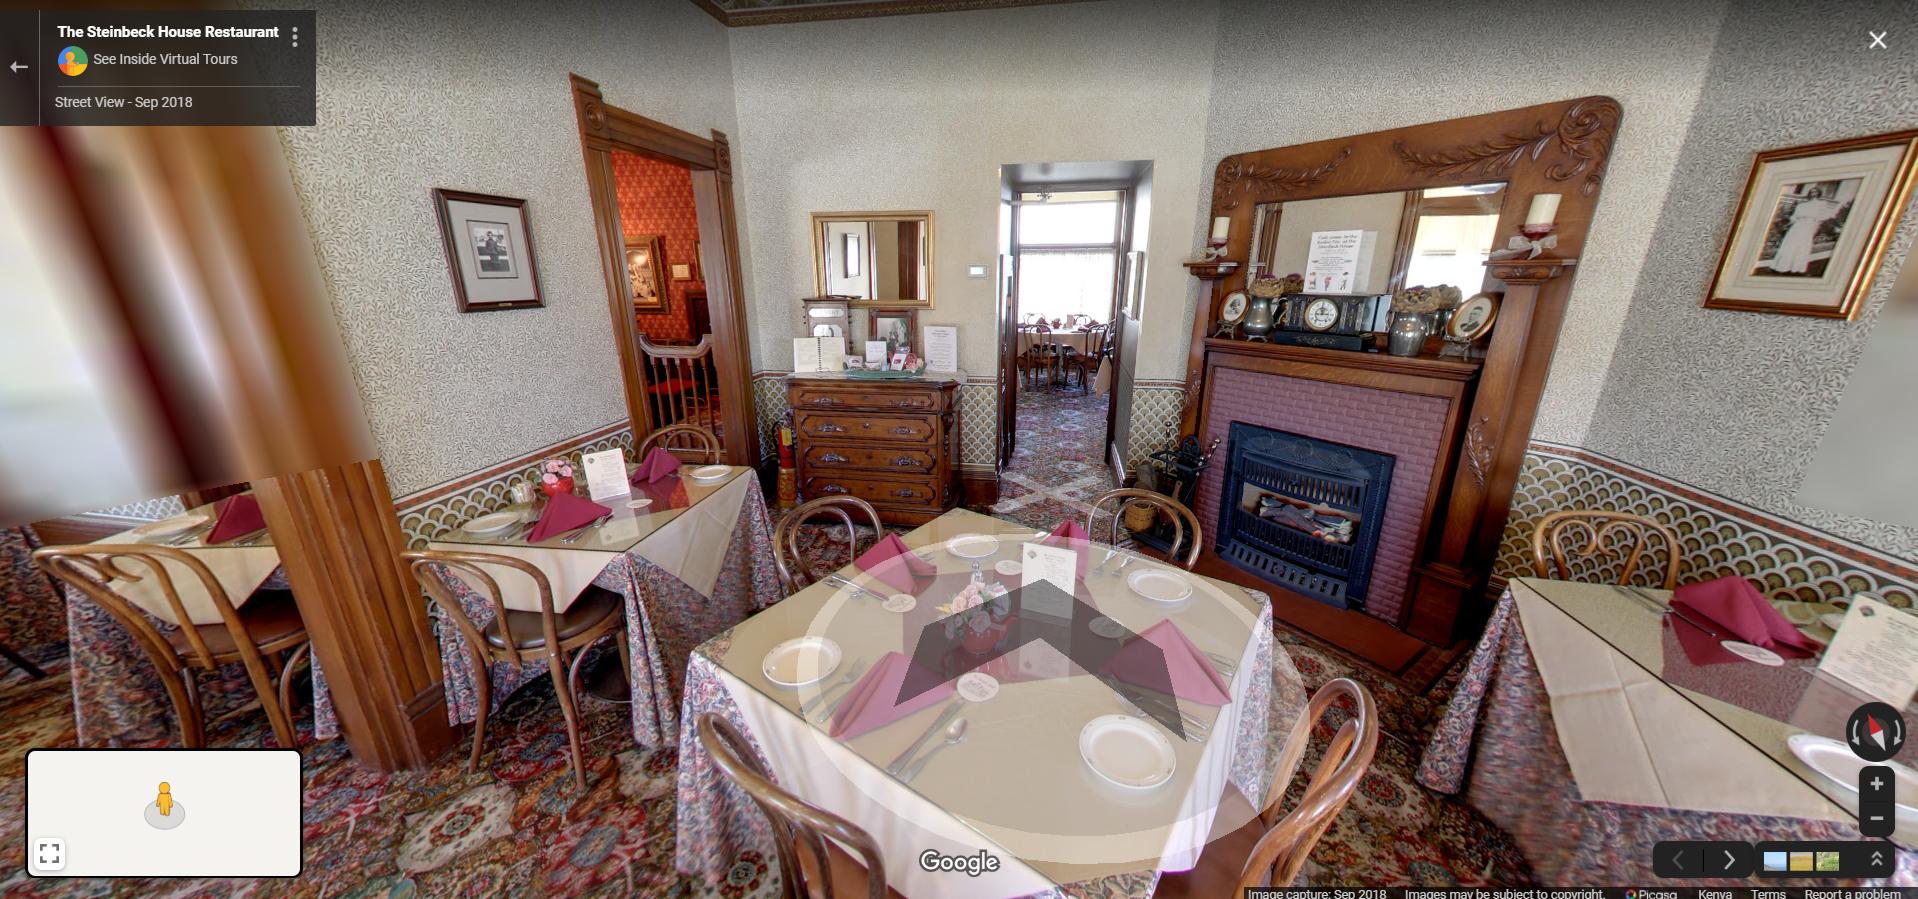 The Steinbeck House Restaurant  Salinas